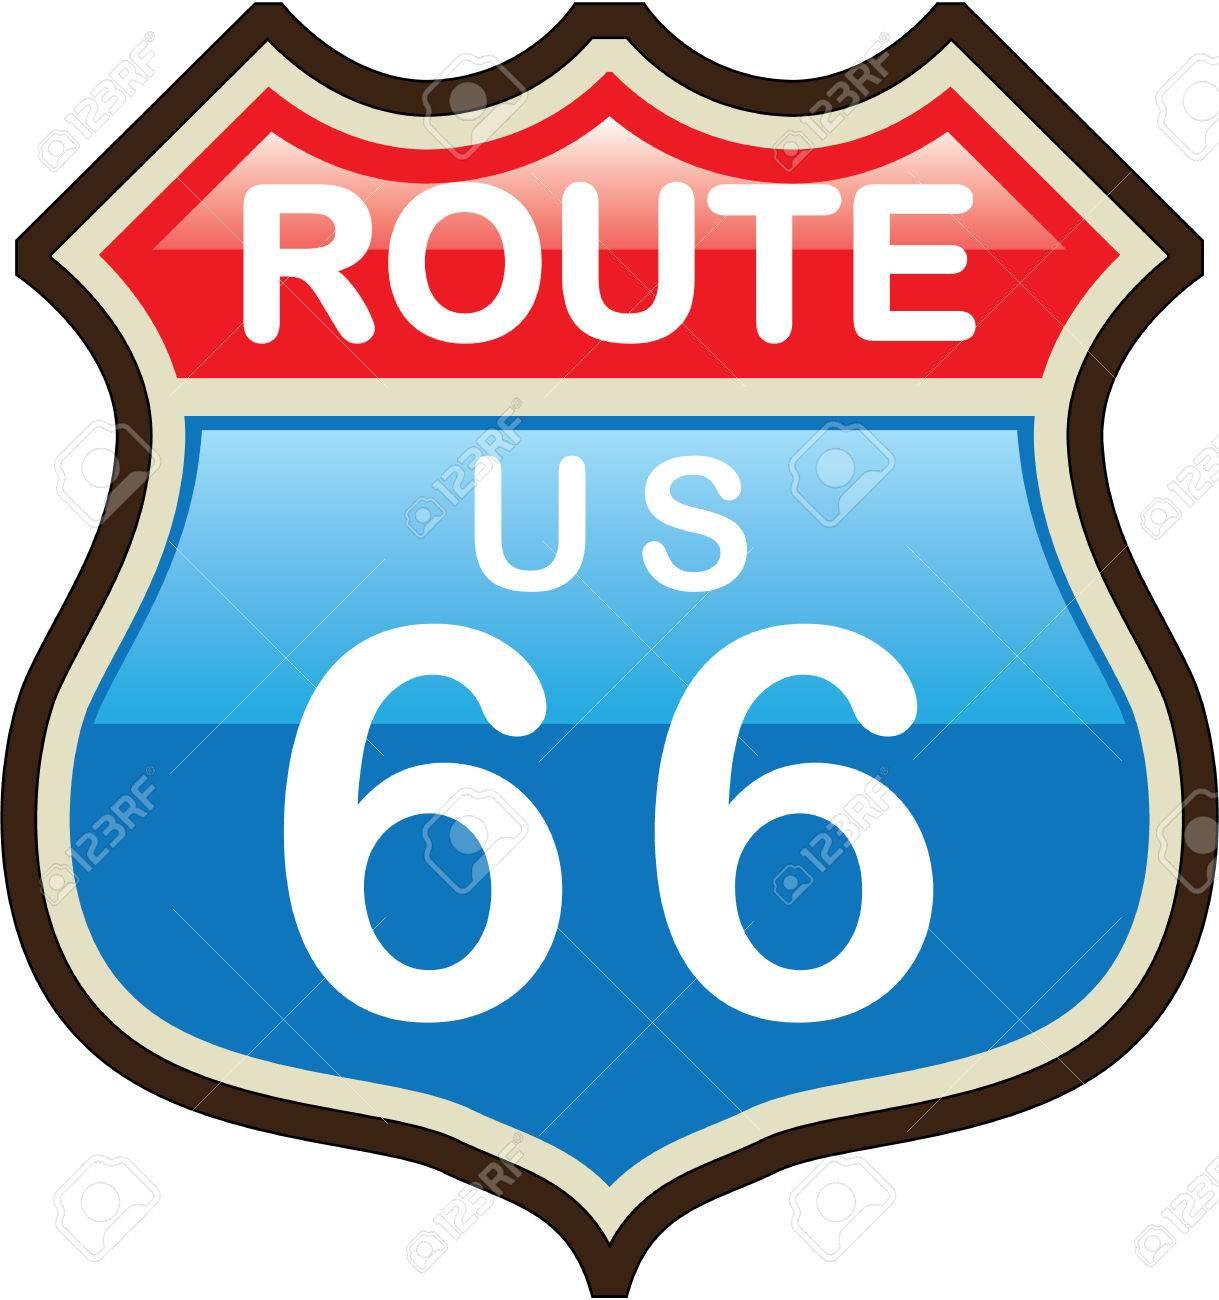 Route 66 vector illustration clip.